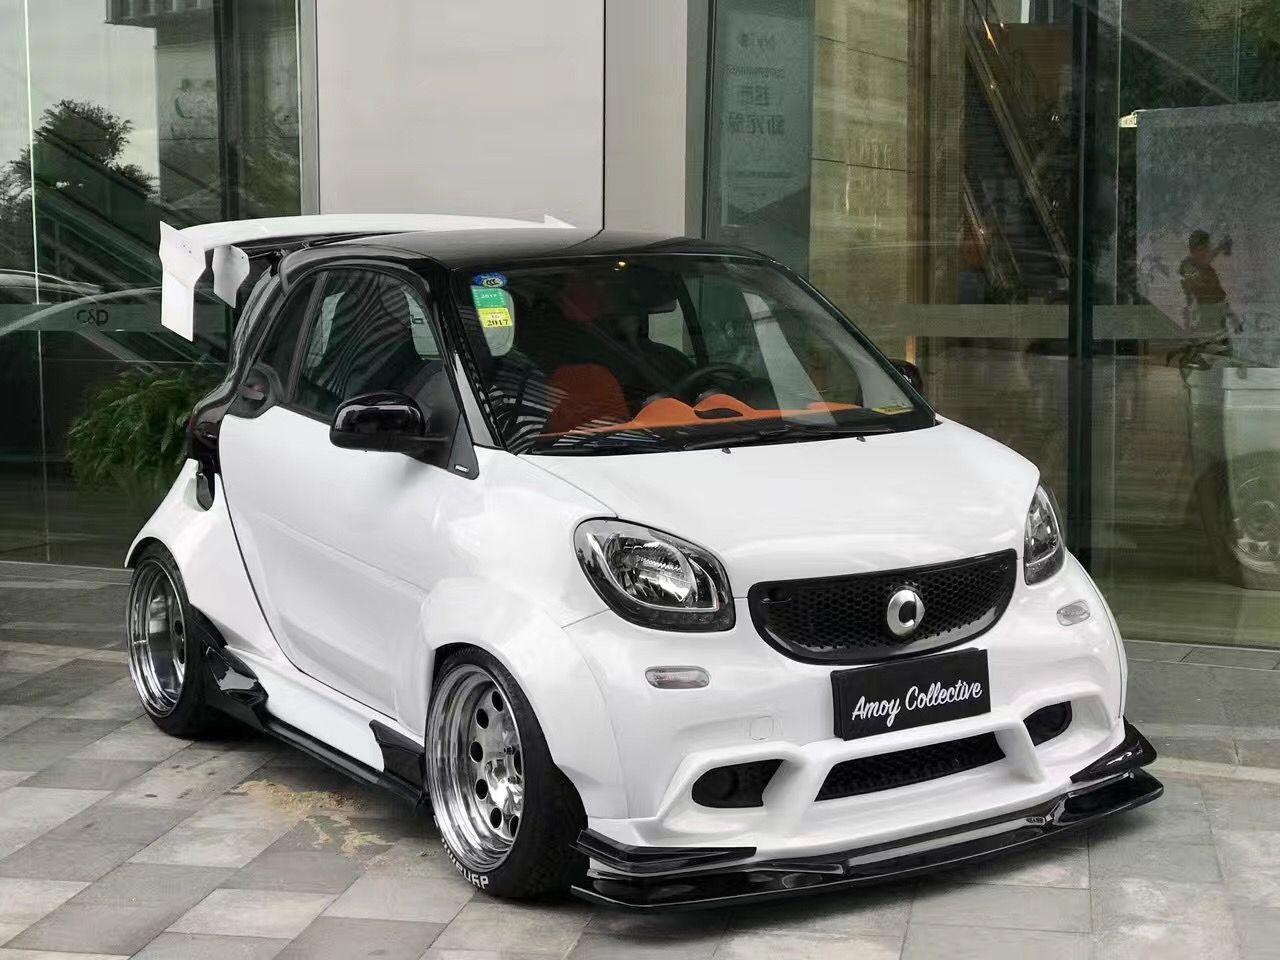 Smart 453 wide body Dynamics Performance Engineering